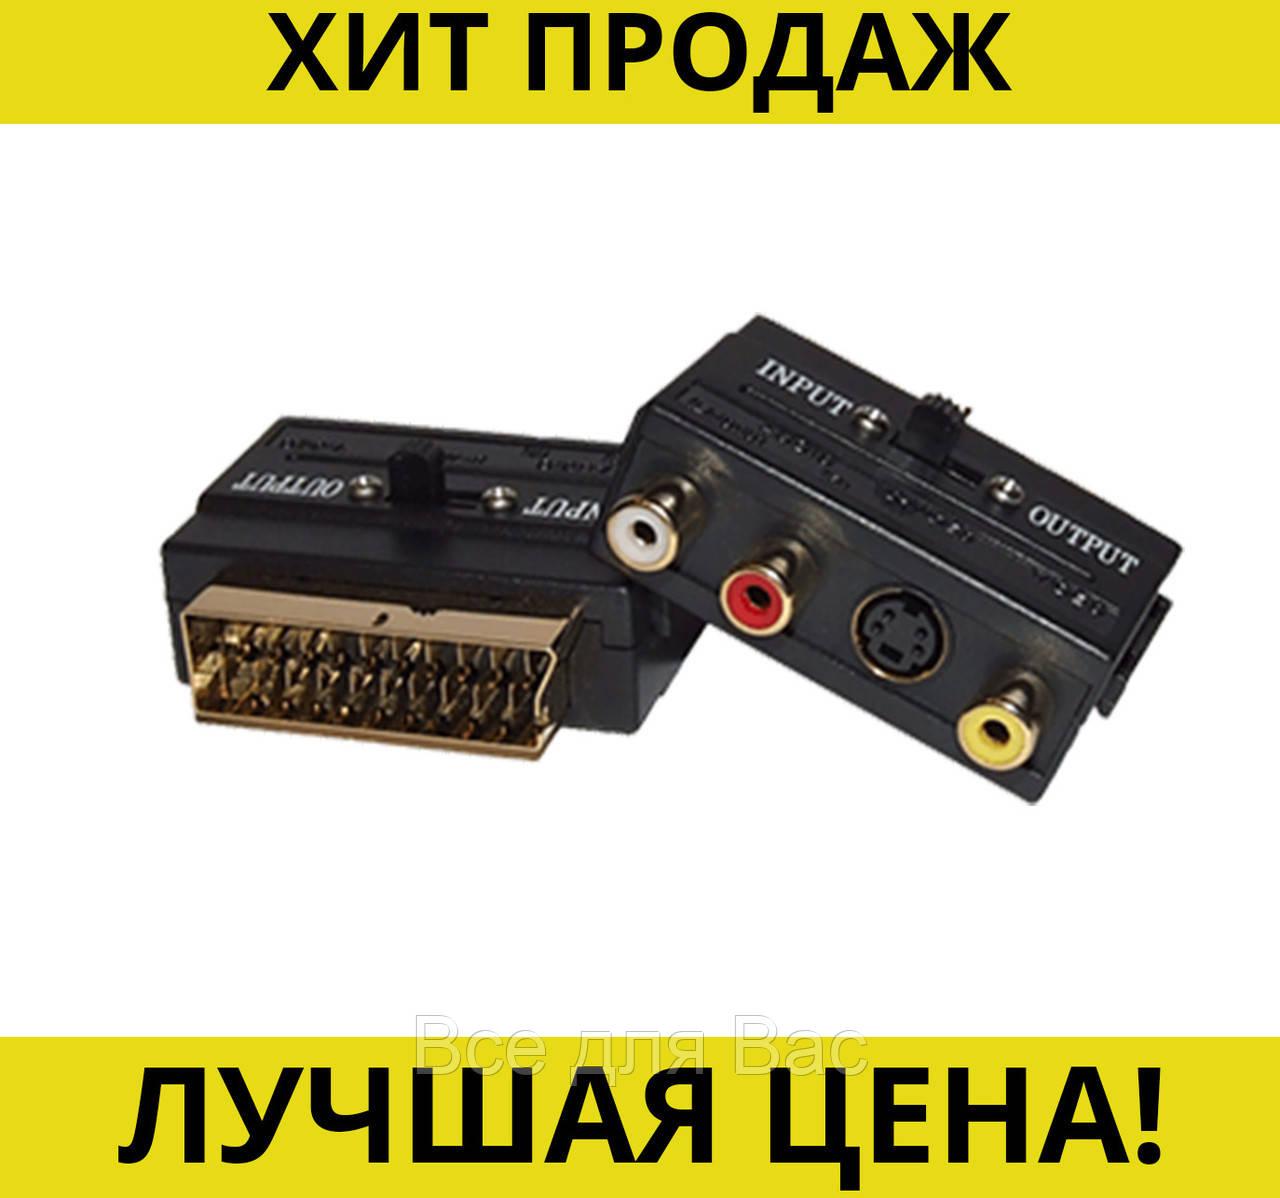 Переходник 3009 переходник-адаптер scart с переключателем in/out